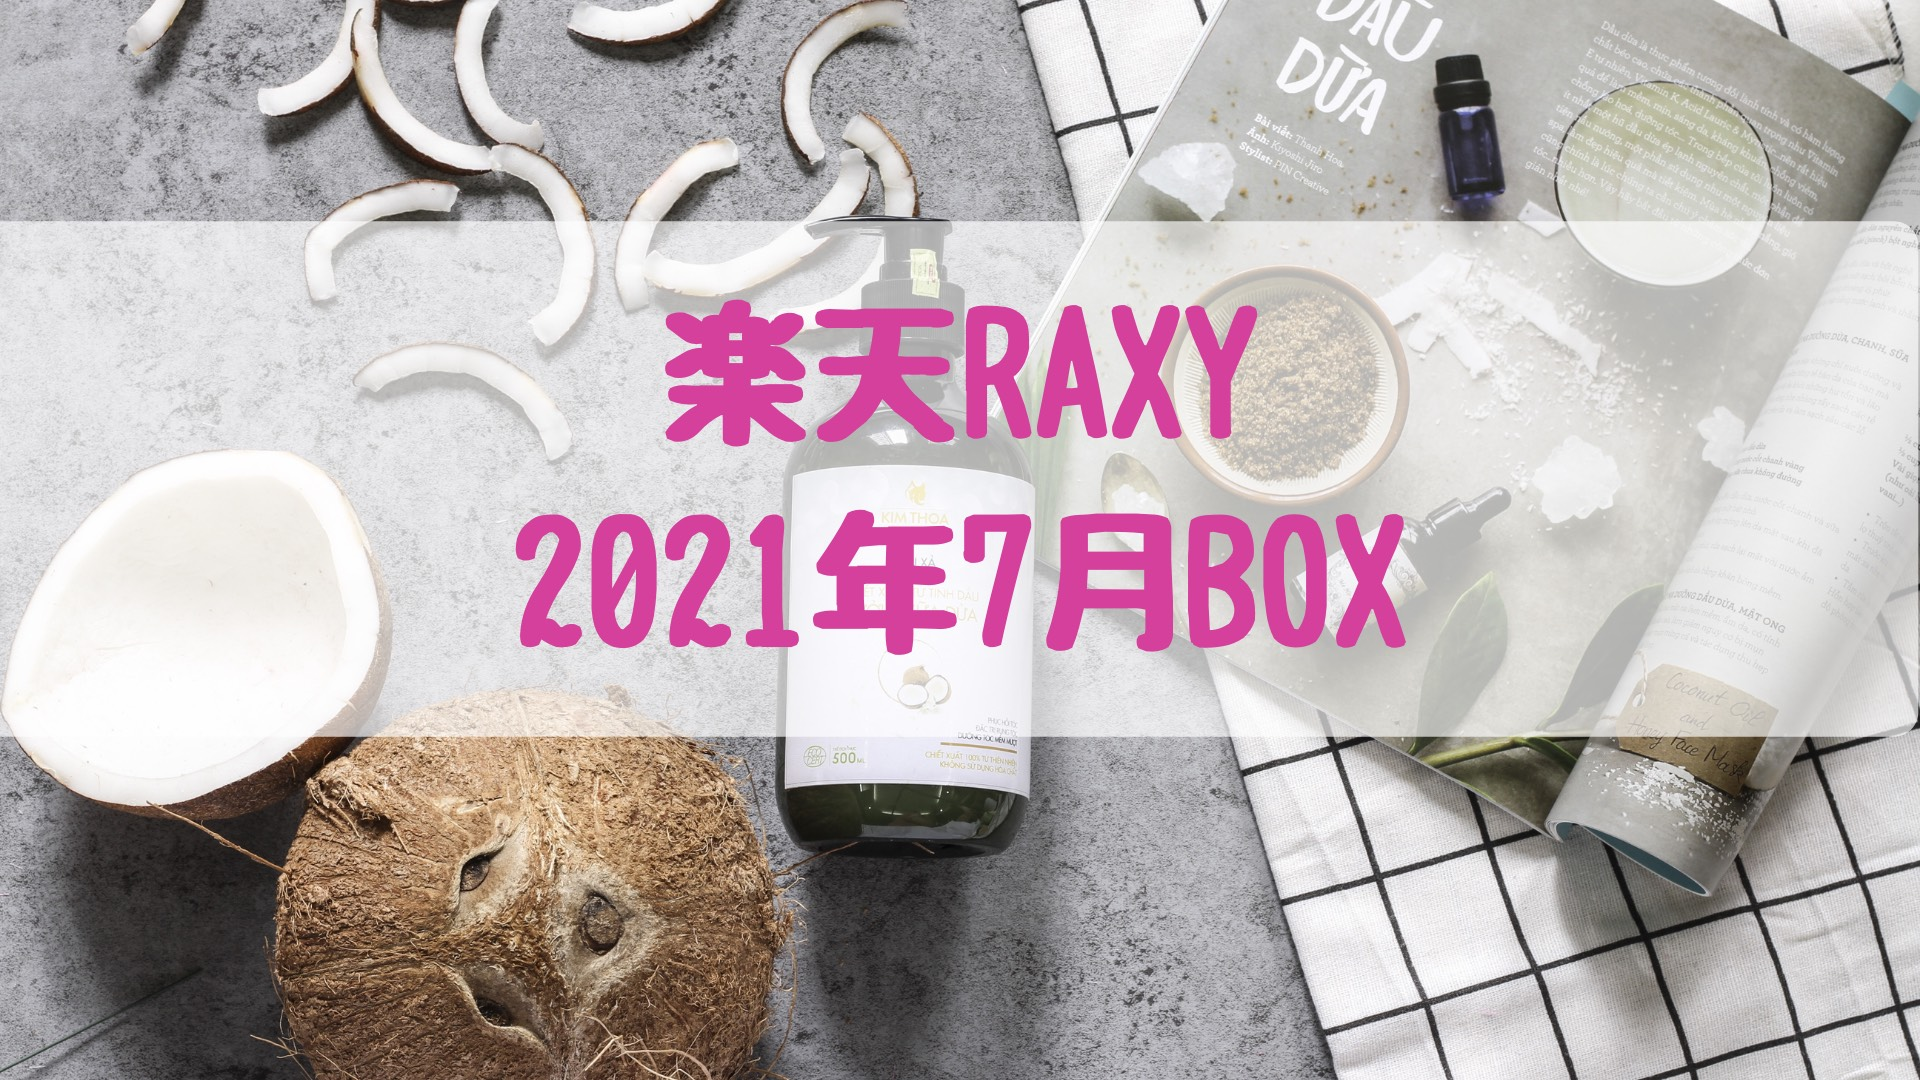 楽天RAXY 2021年7月BOX